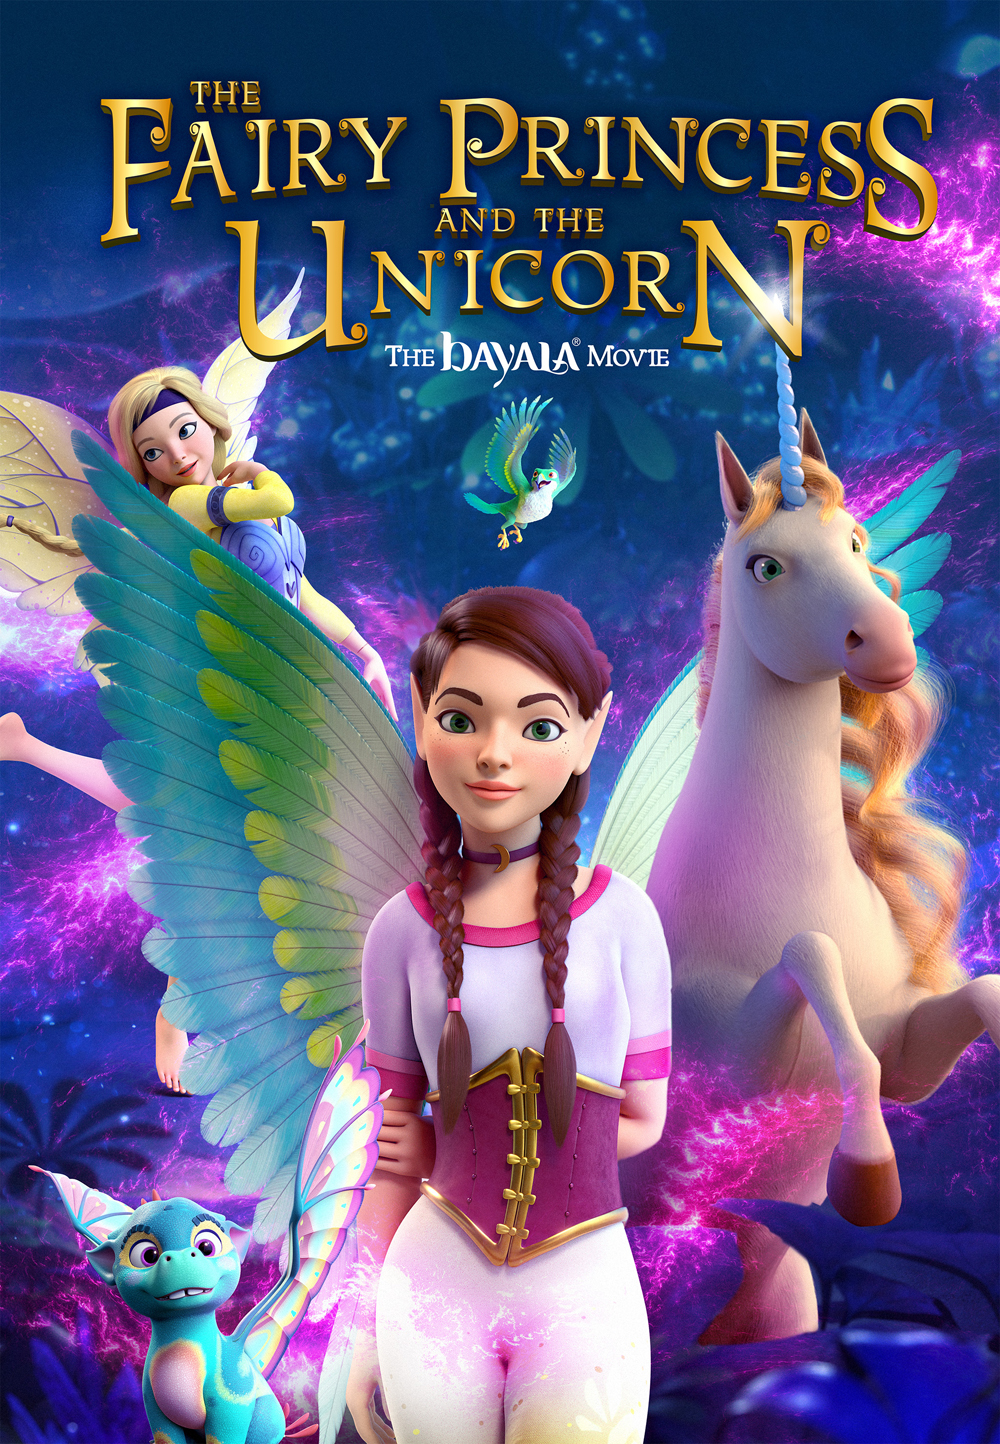 The Fairy Princess and the Unicorn: The Bayala Movie